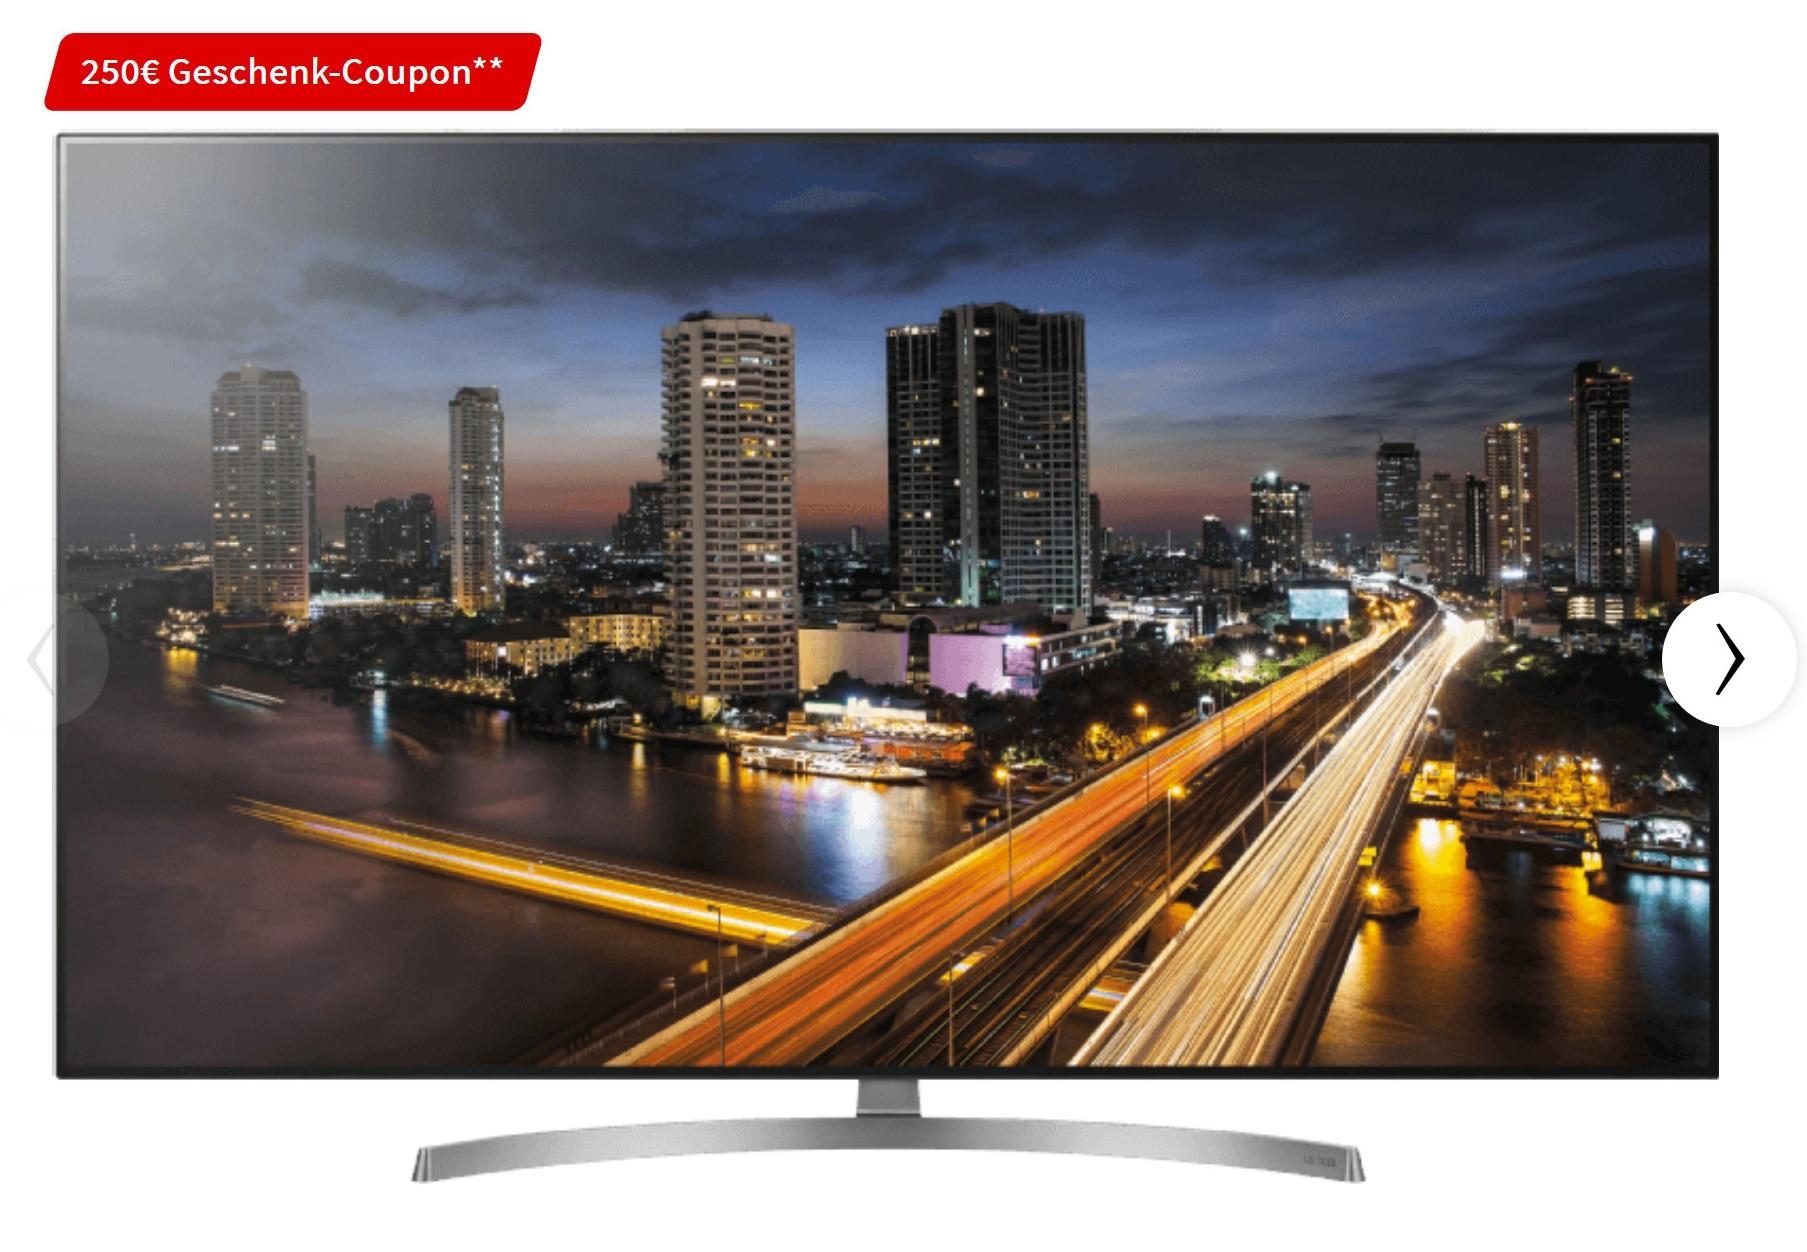 LG OLED65B87LC OLED TV 65 Zoll 4K UHD + 250€  MM Coupon (10bit, Dolby Vision, HDR10, HLG)